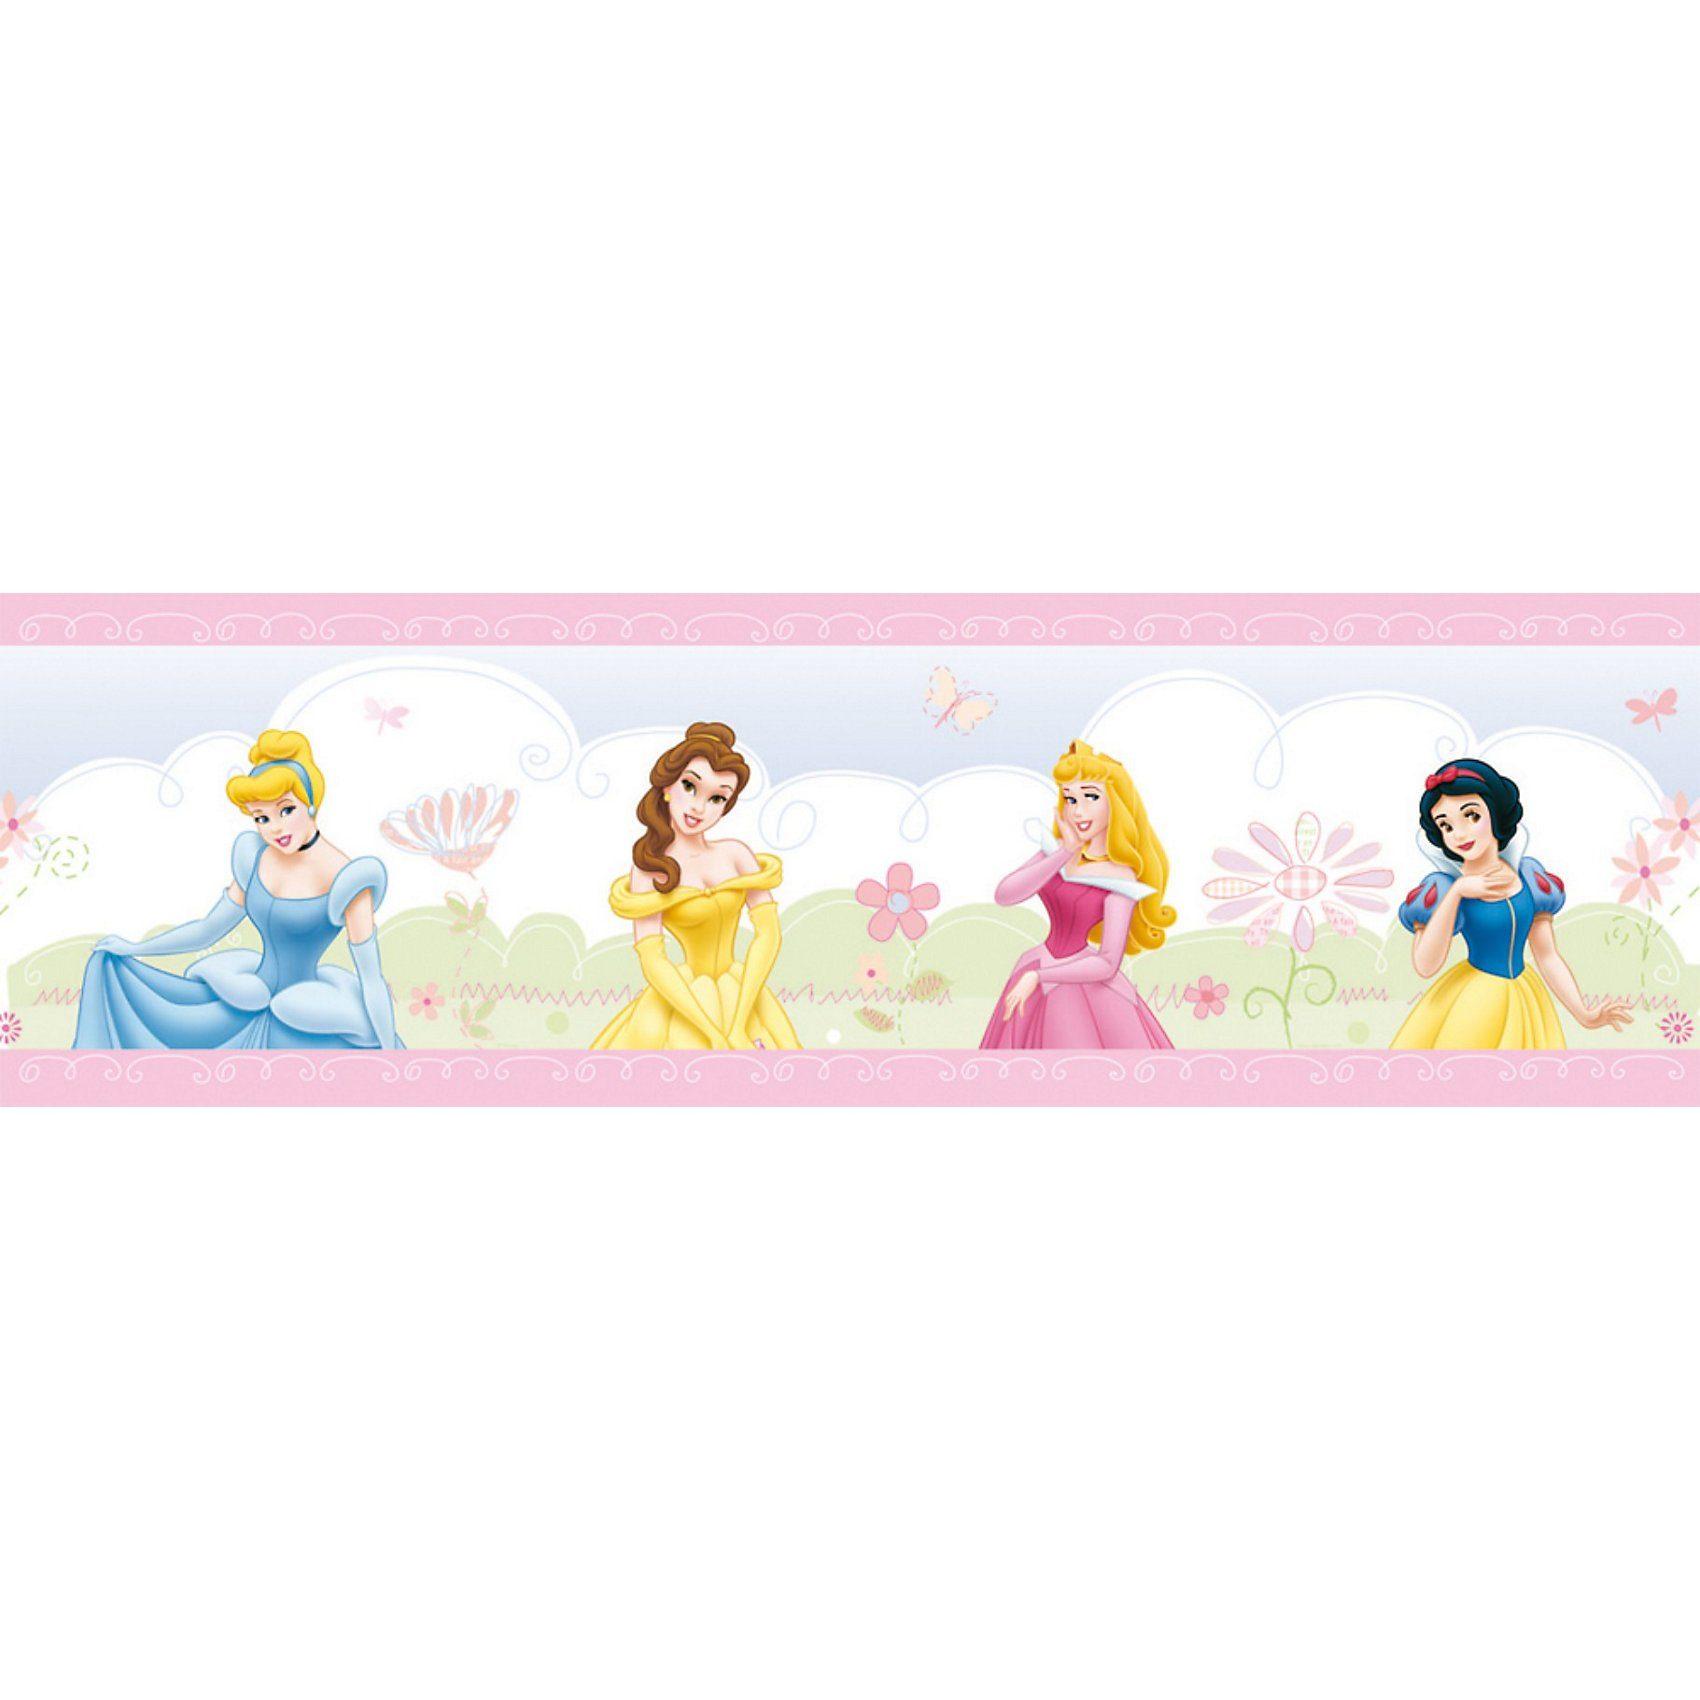 Decofun Bordüre Disney Princess Castle, 5 m x 15,9 cm